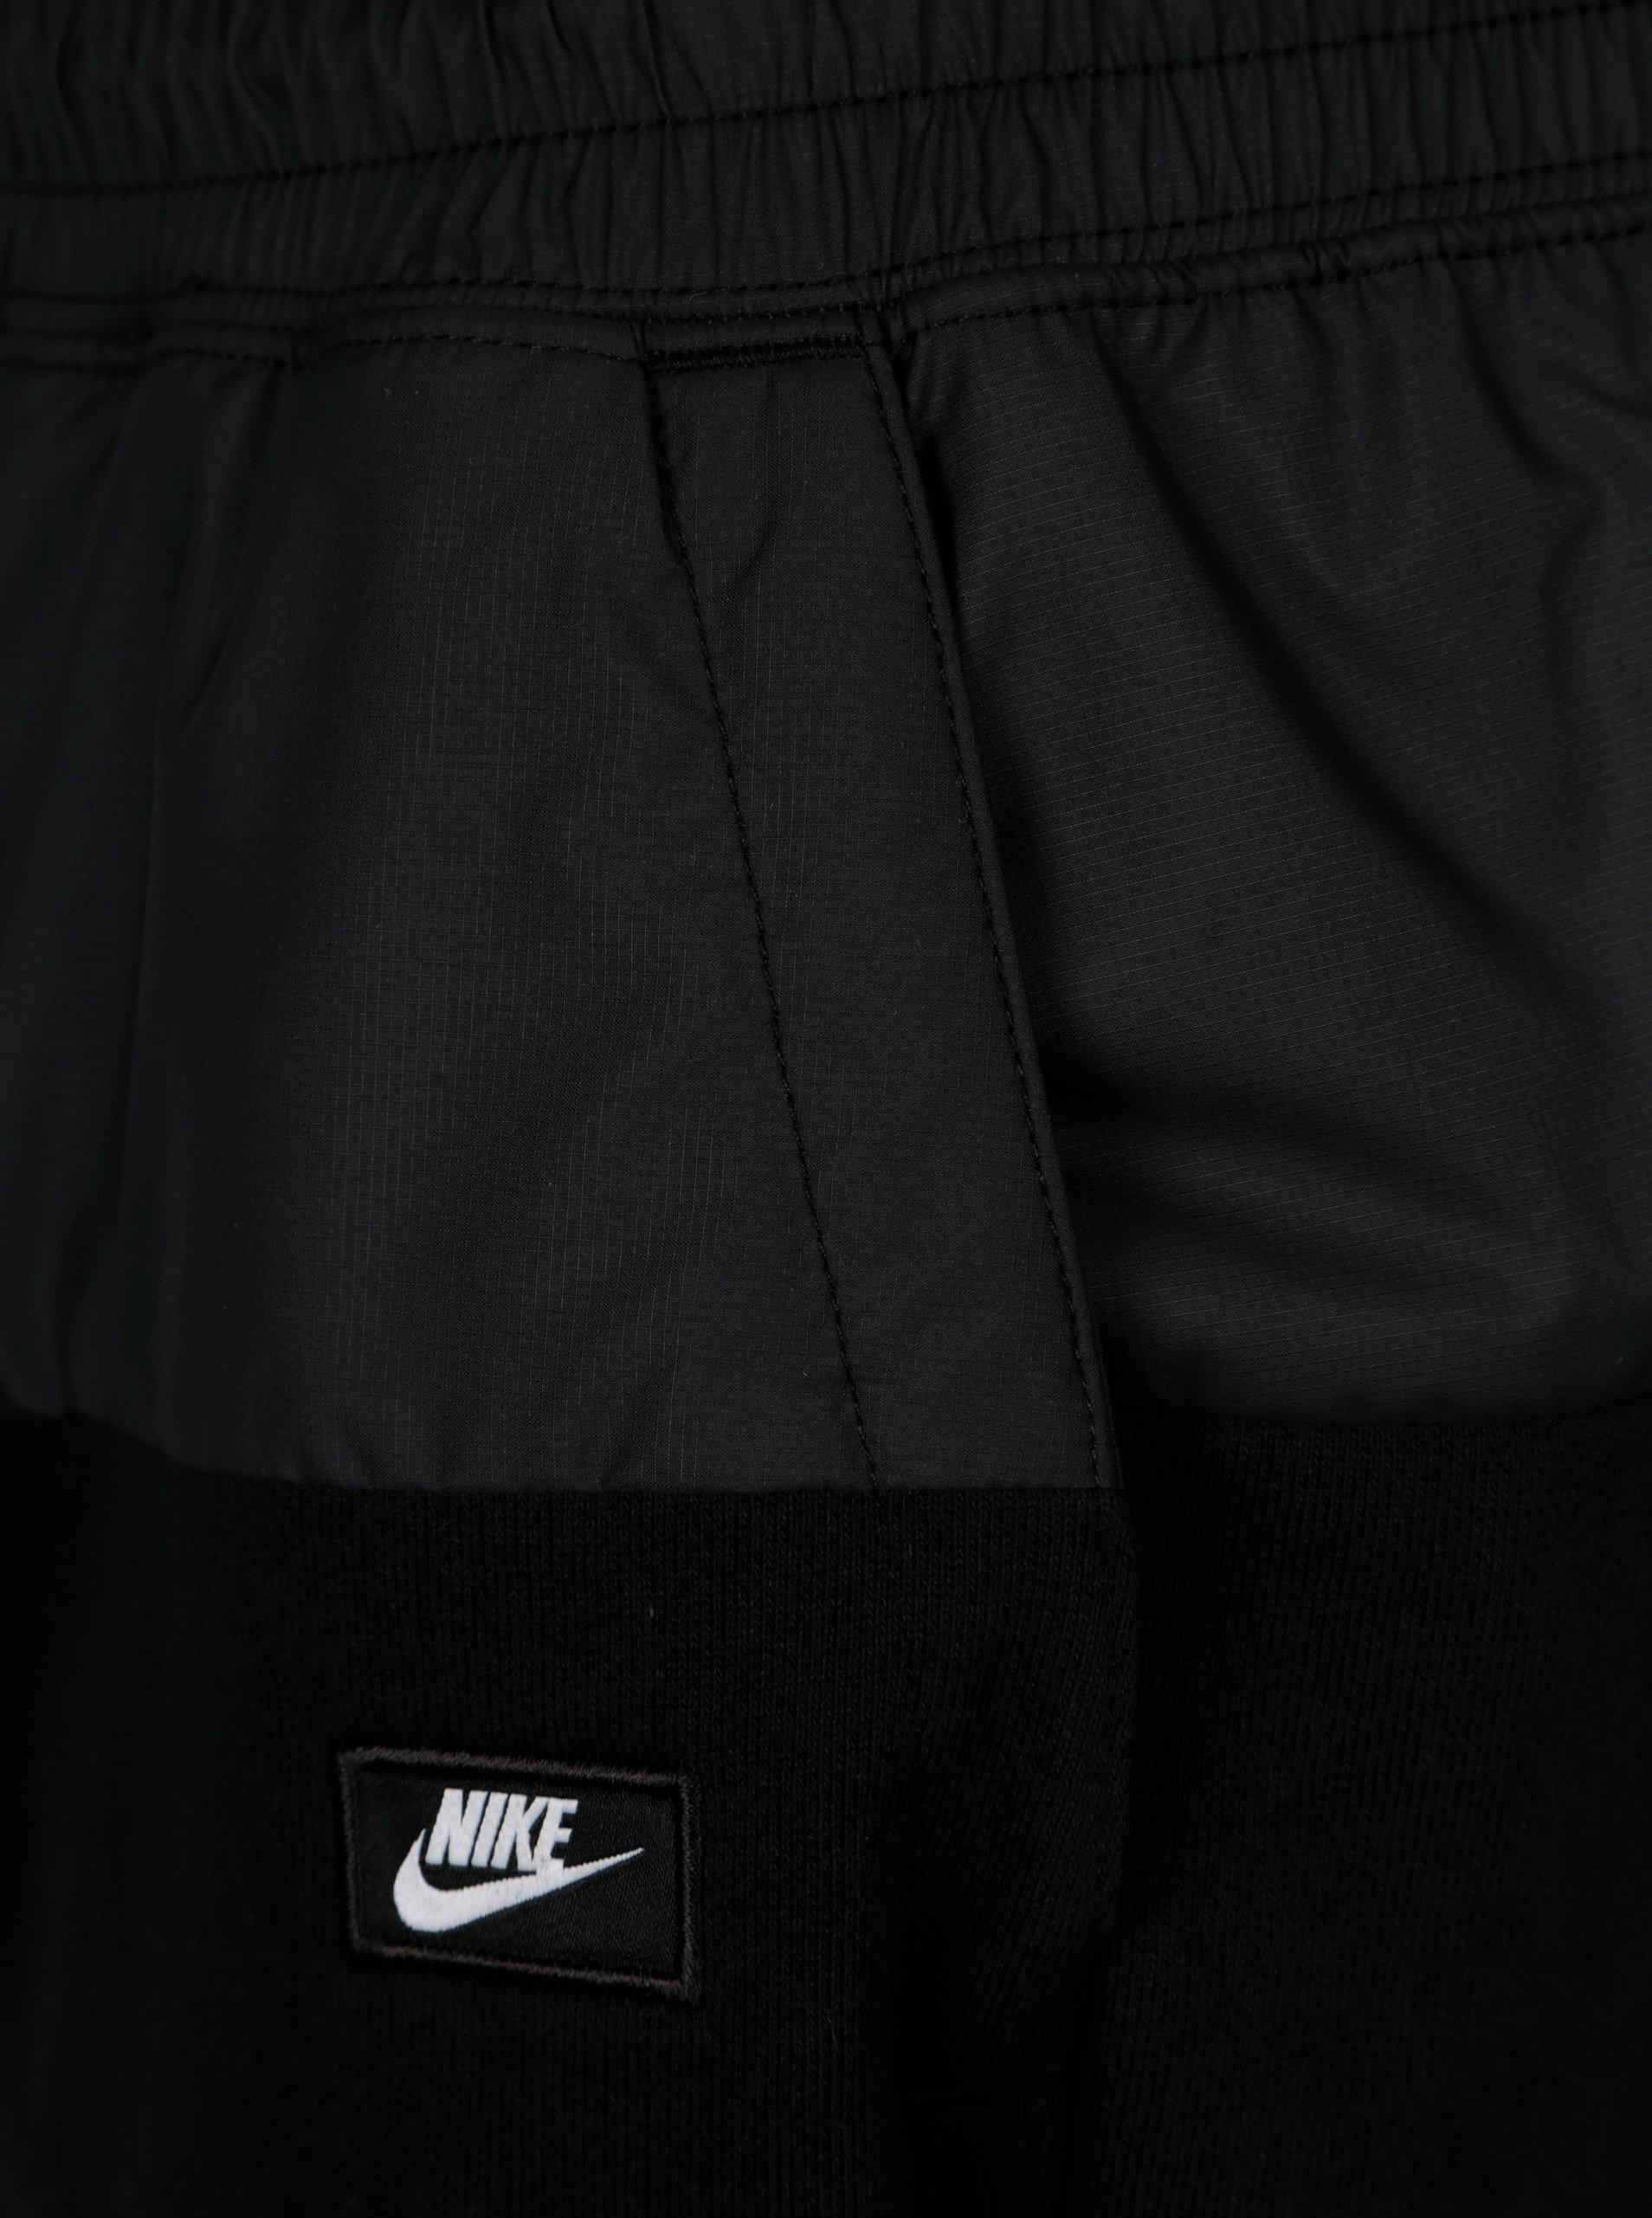 Černé pánské kraťasy s pružným pasem Nike ... 609e9190f4